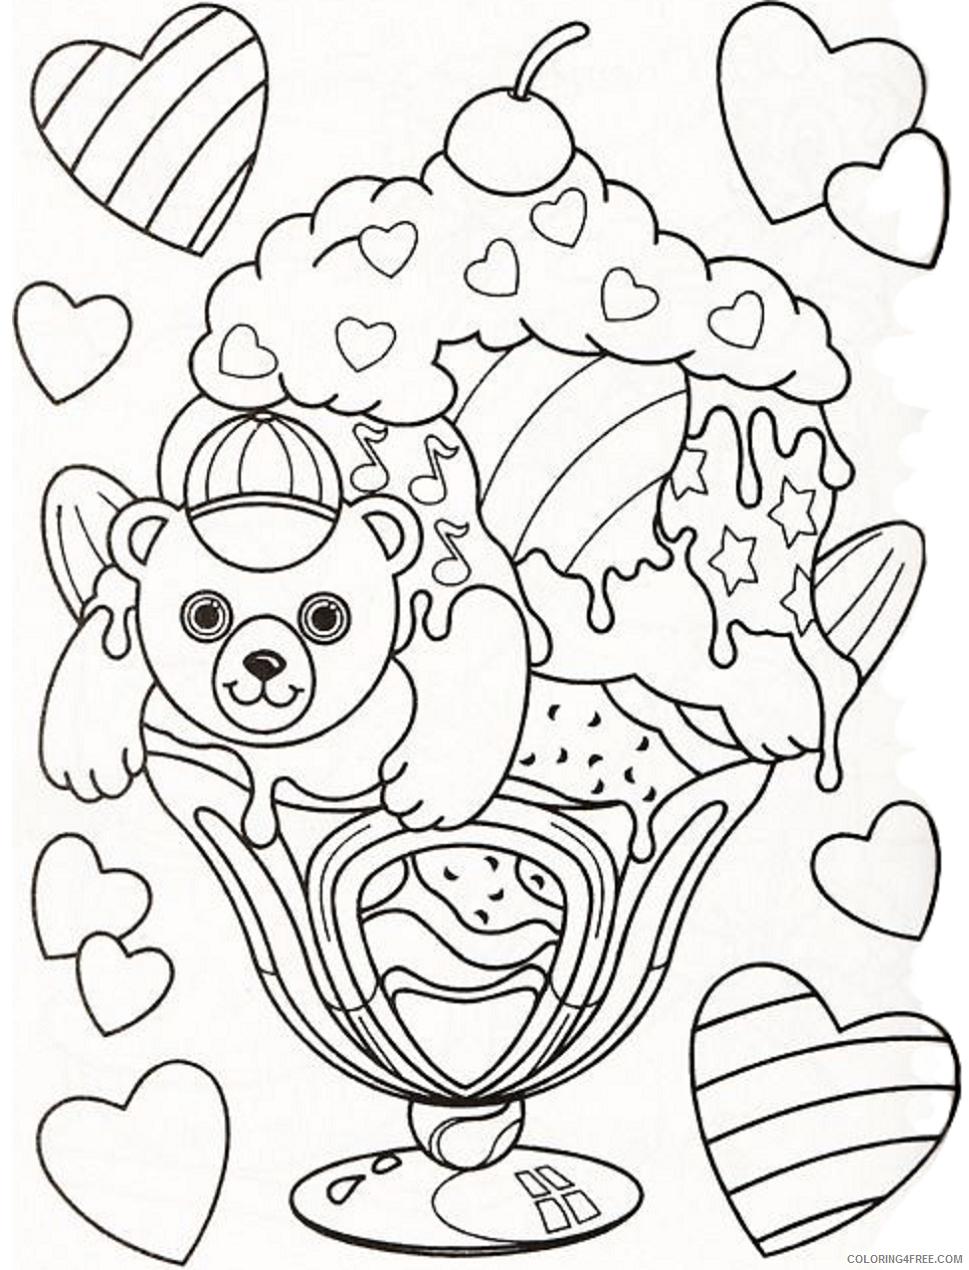 Lisa Frank Coloring Pages hollywood_bear_lisa_frank Printable 2021 3860 Coloring4free